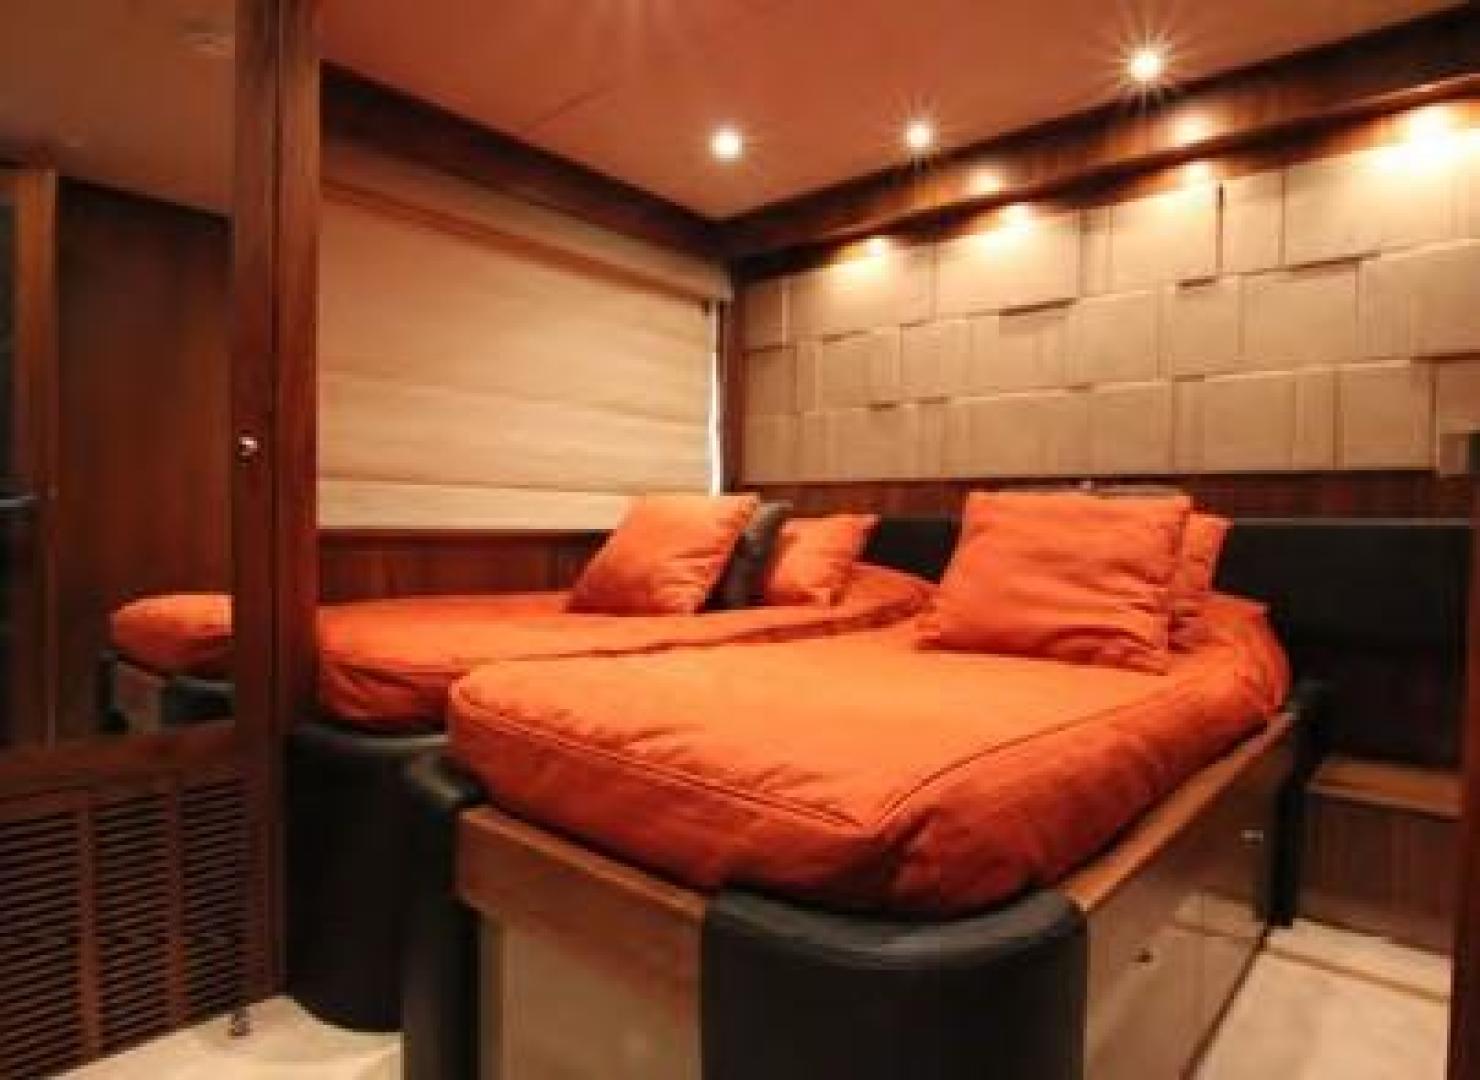 Sunseeker-Flybridge Motoryacht 2009-ANNABEL Mallorca-Spain-Starboard Guest Stateroom-902623 | Thumbnail